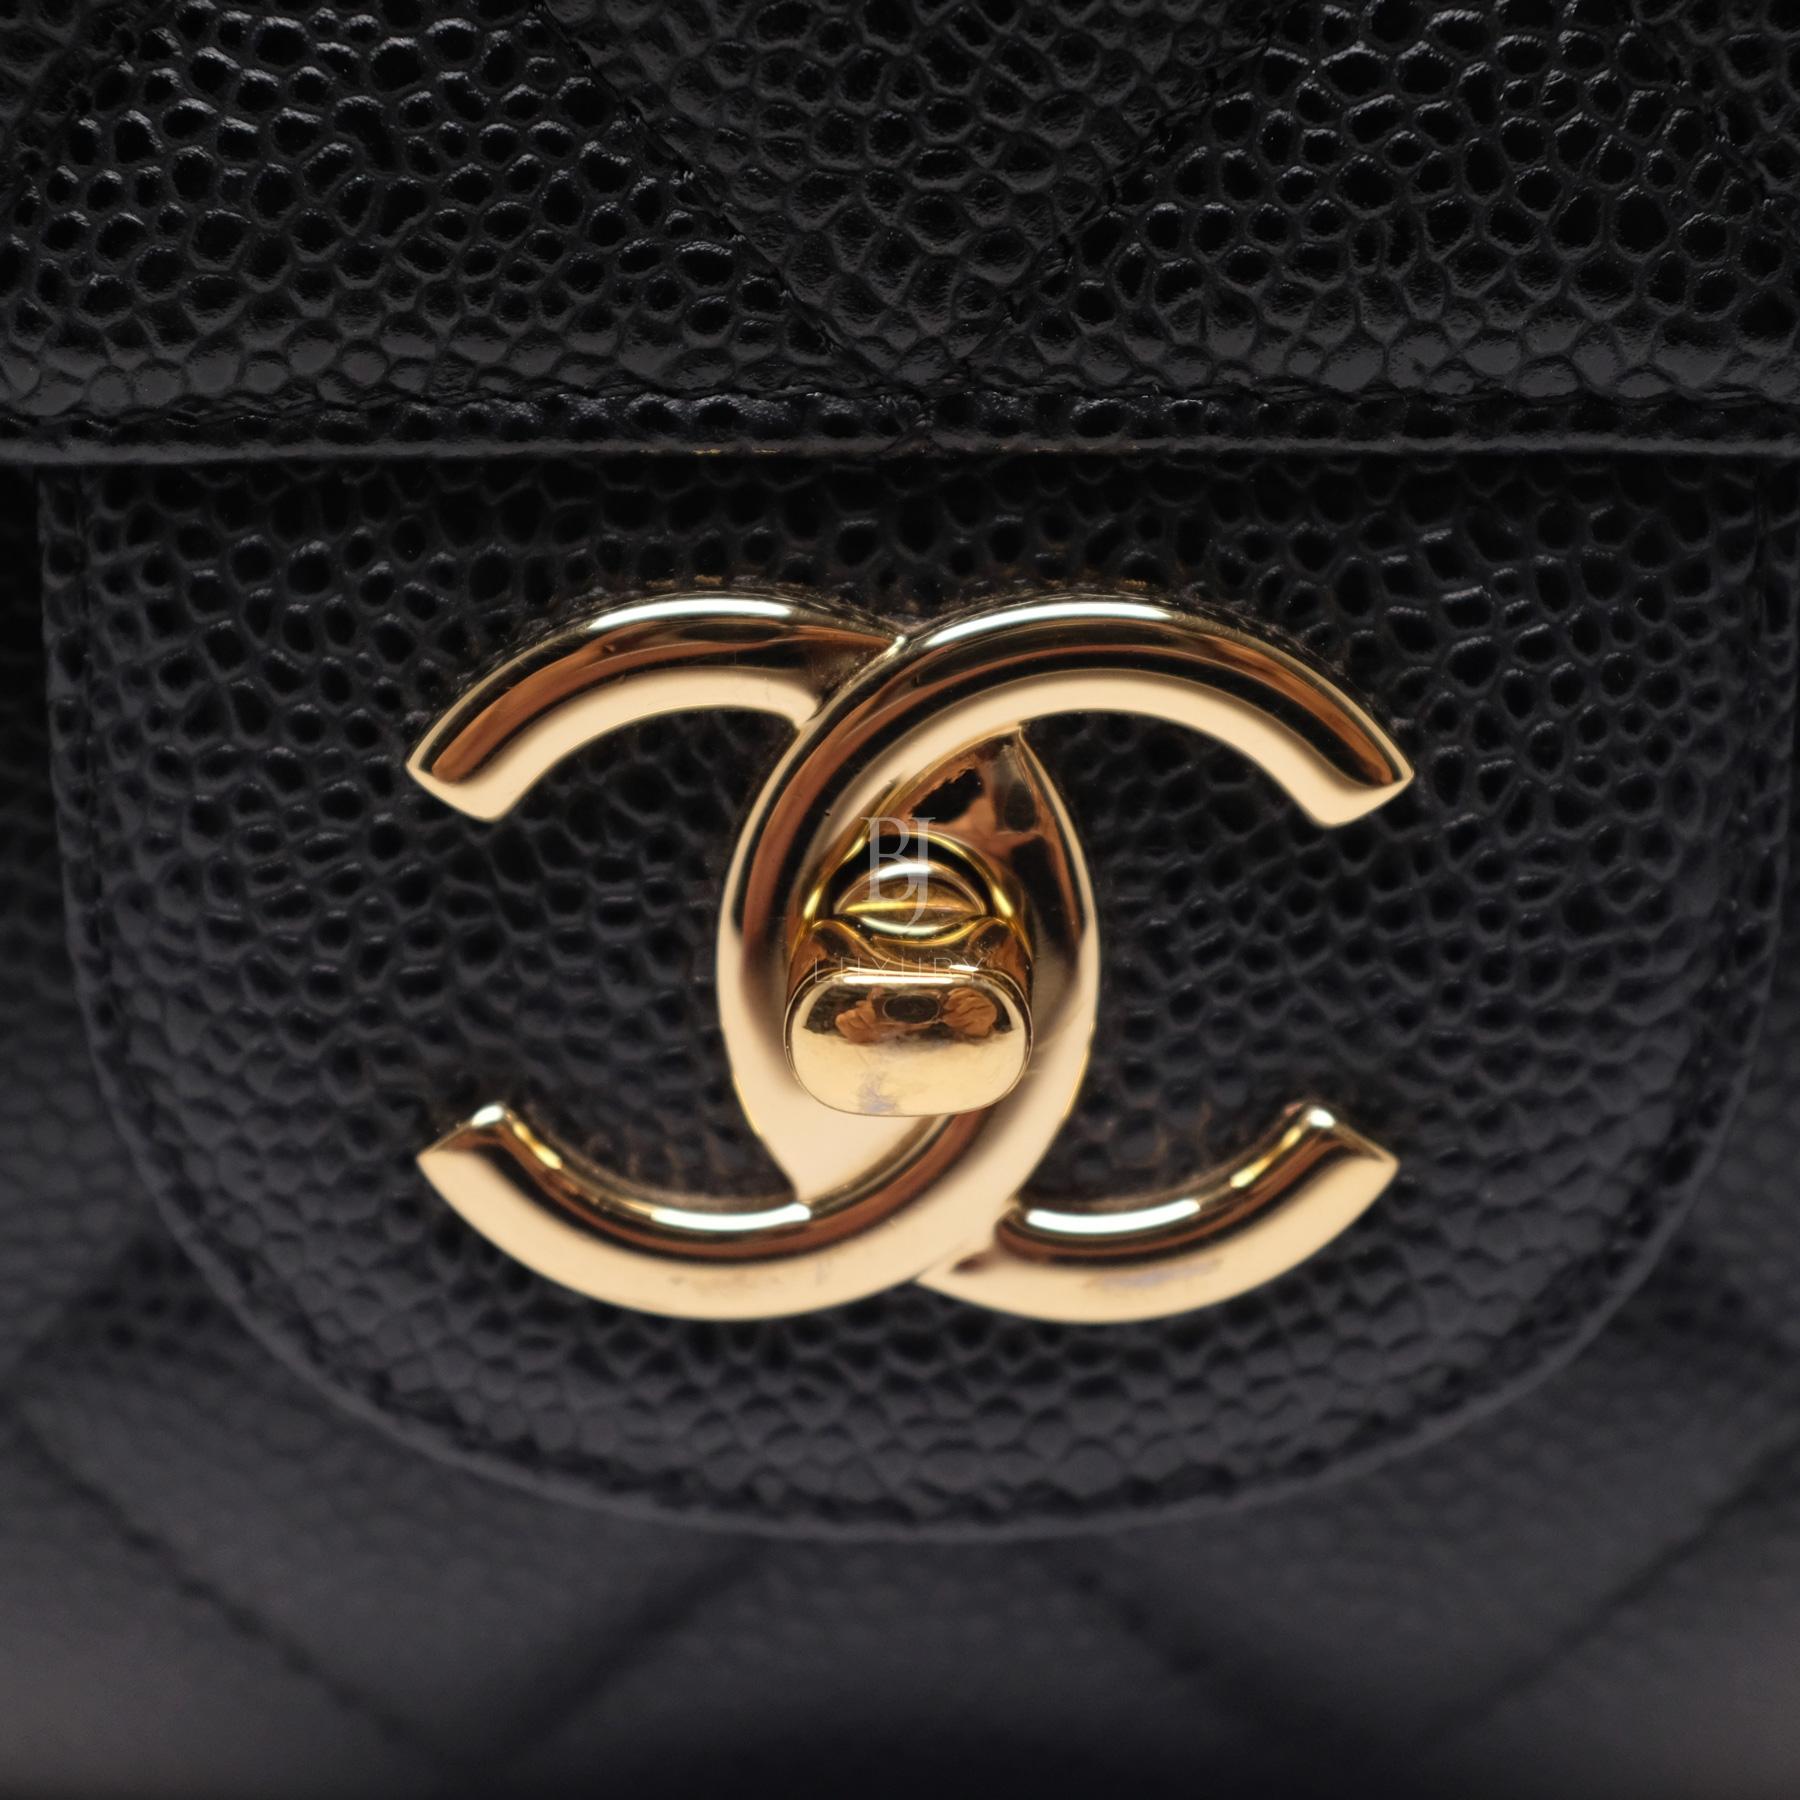 Chanel Classic Handbag Caviar Maxi Black BJ Luxury 13.jpg